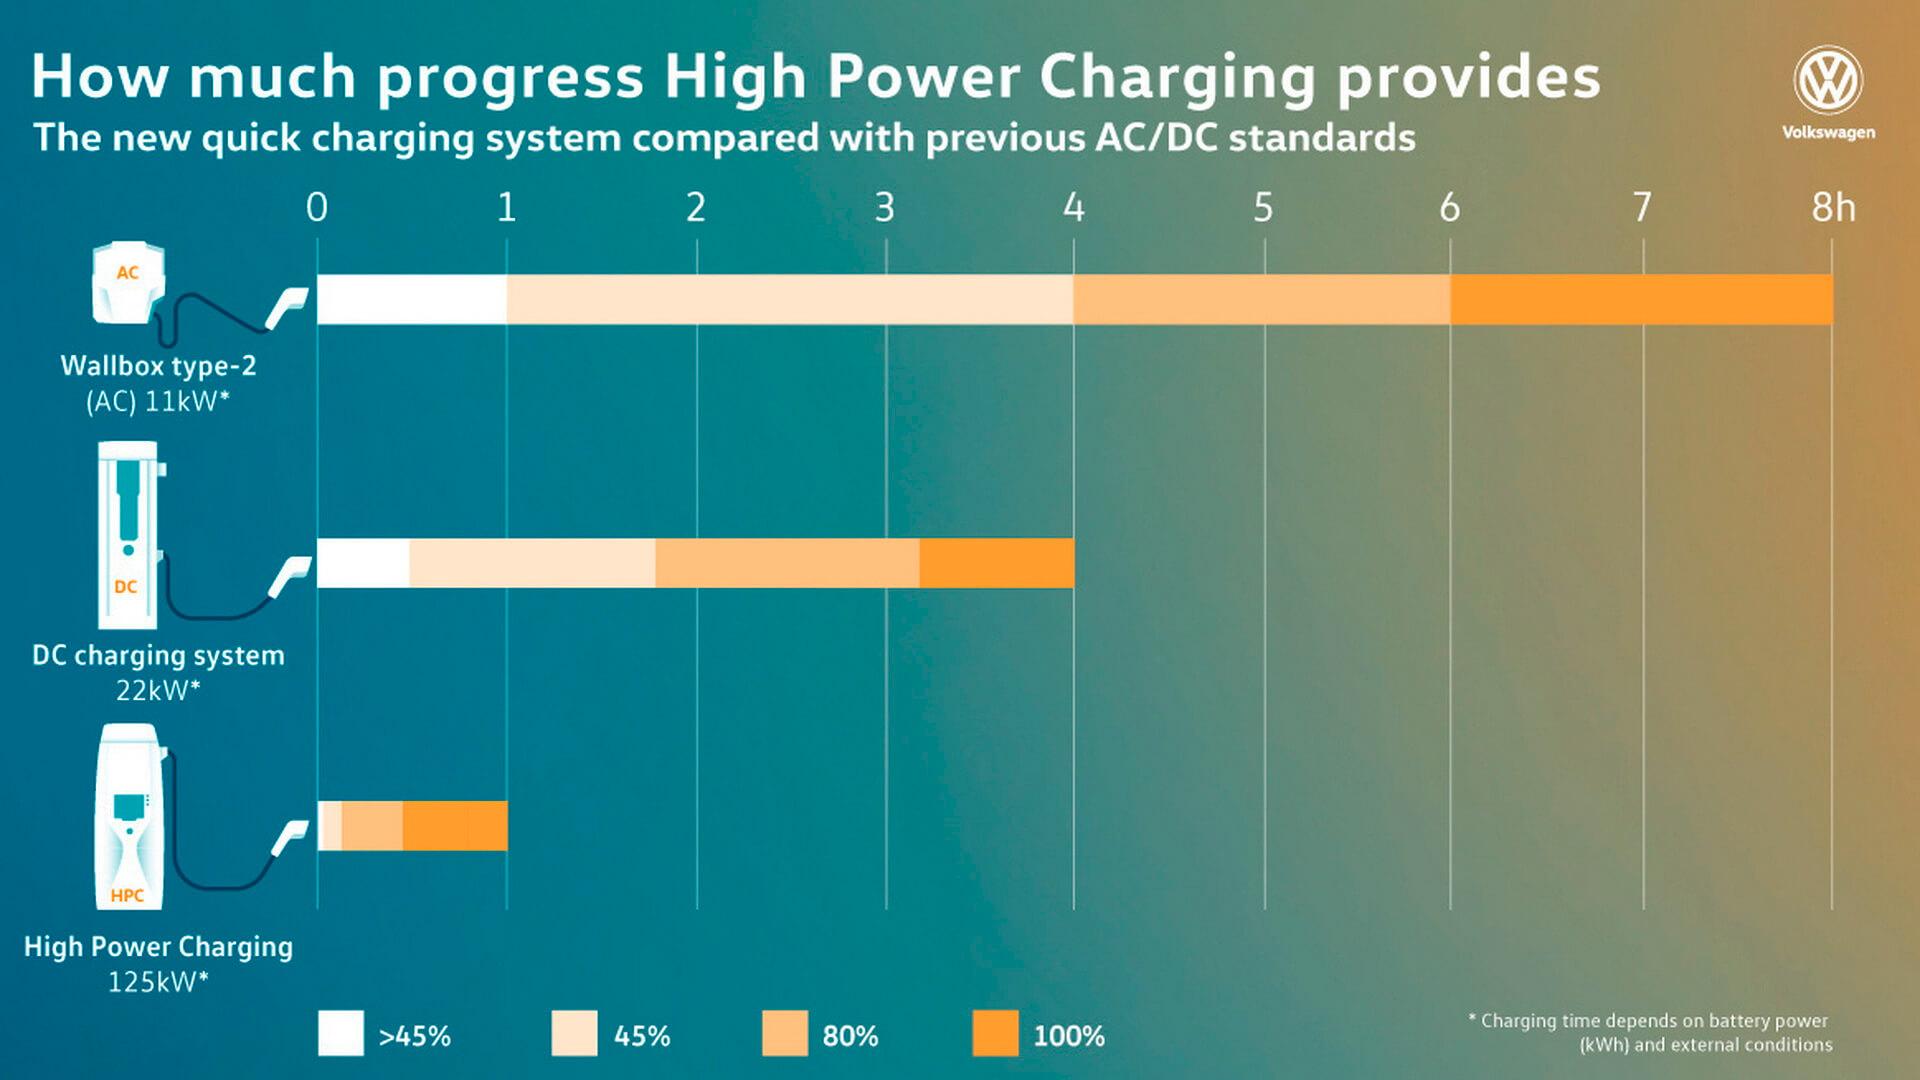 Время зарядки электрокаров на платформе MEB в зависимости от типа и мощности станции